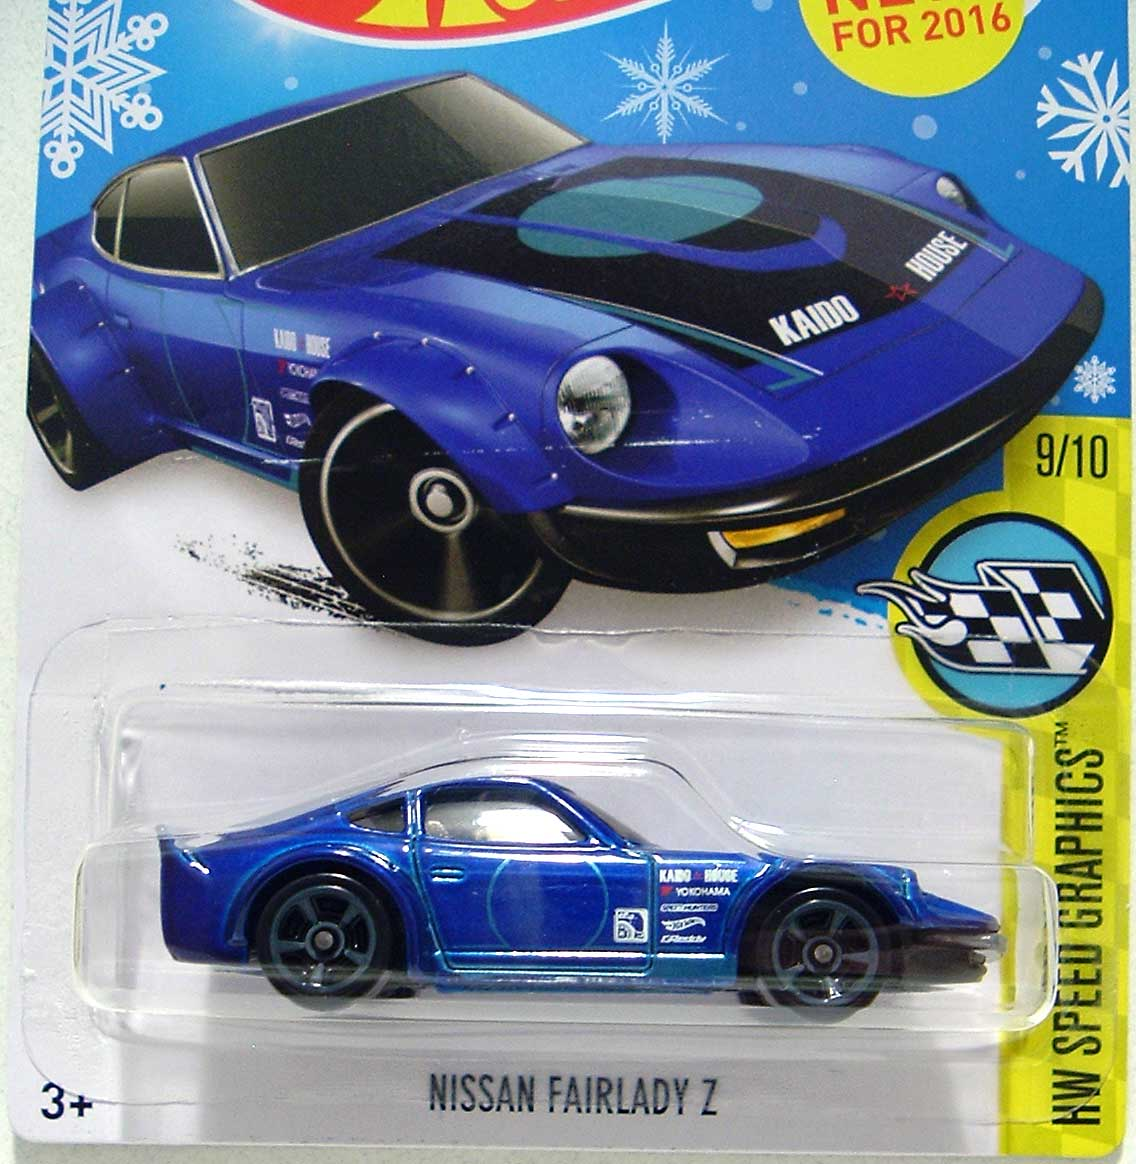 Nissan Fairlady Z Hot Wheels Wiki Autos Post